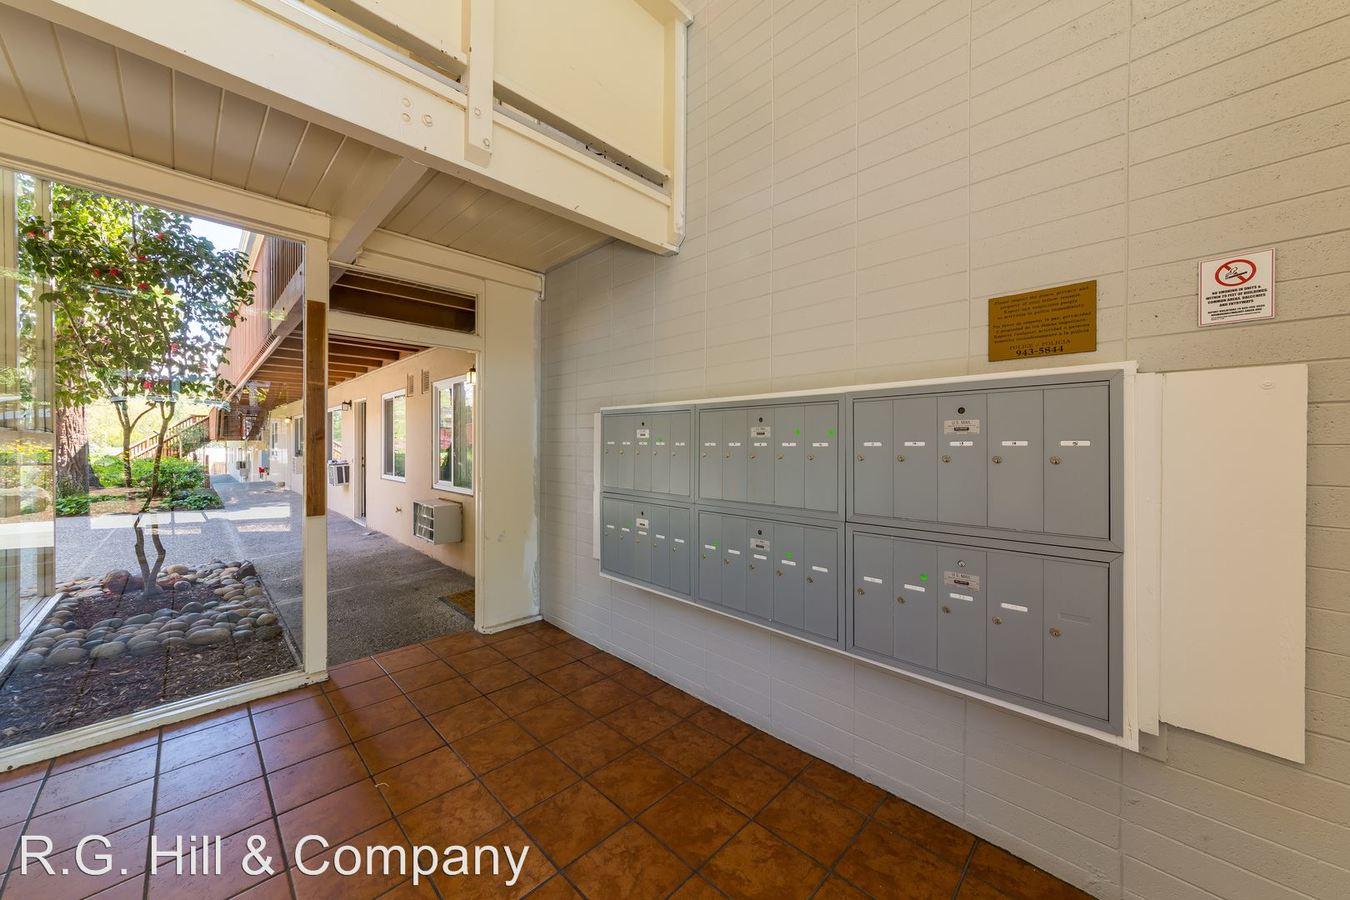 2 Bedrooms 1 Bathroom Apartment for rent at 1384 Oakland Blvd. in Walnut Creek, CA